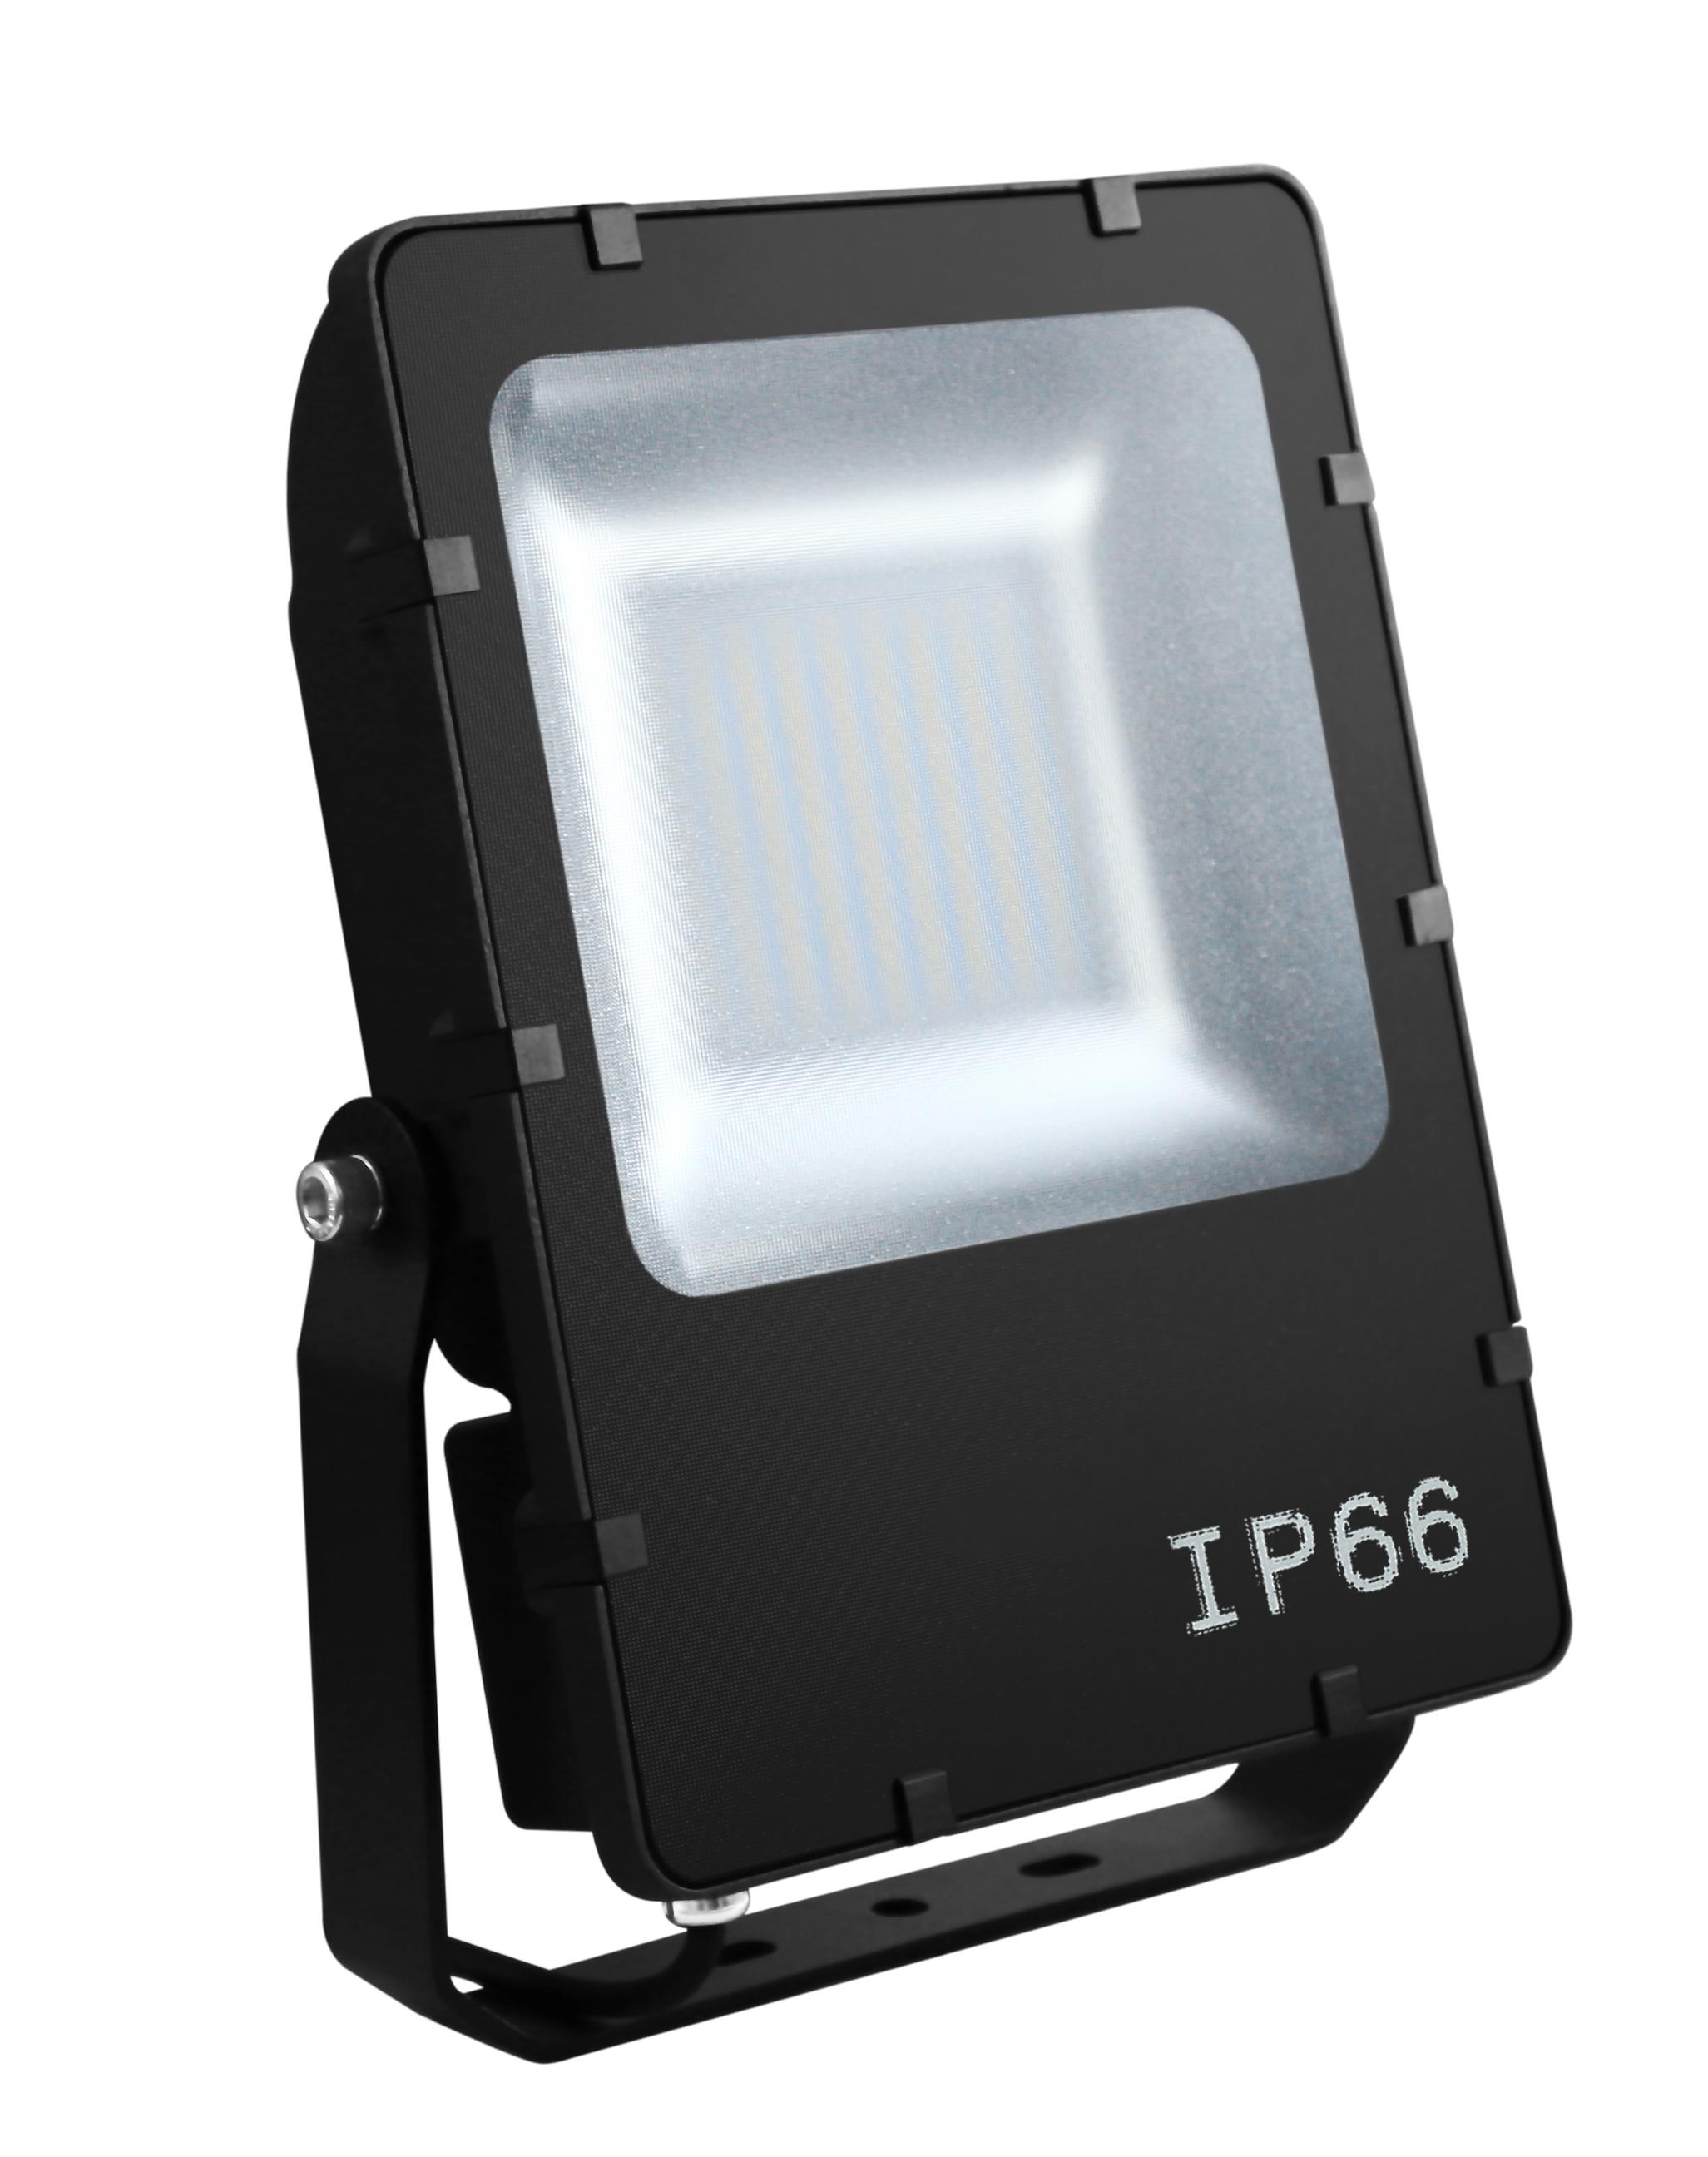 LED Stralers Evolve SMD binnen en buiten